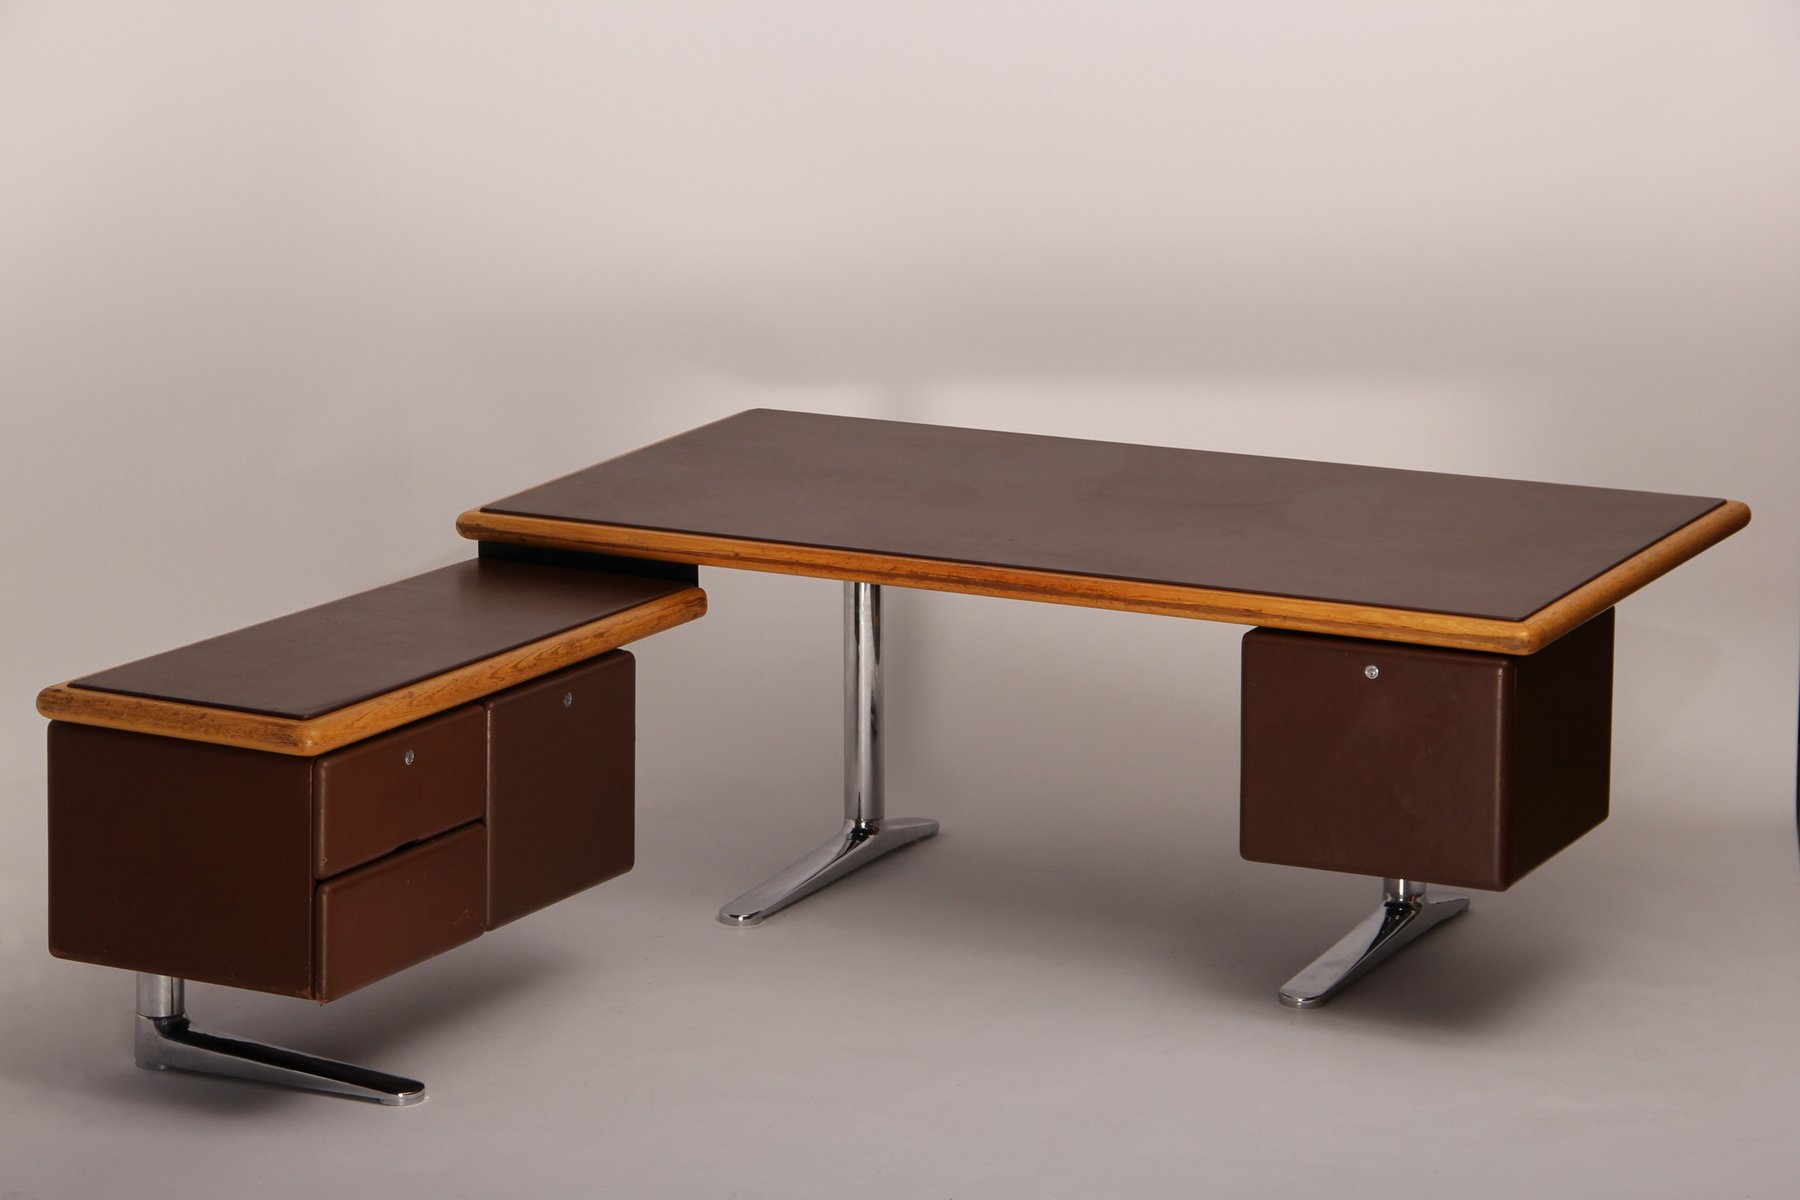 Vintage Executive Desk by Warren Platner for Knoll for sale at Pamono